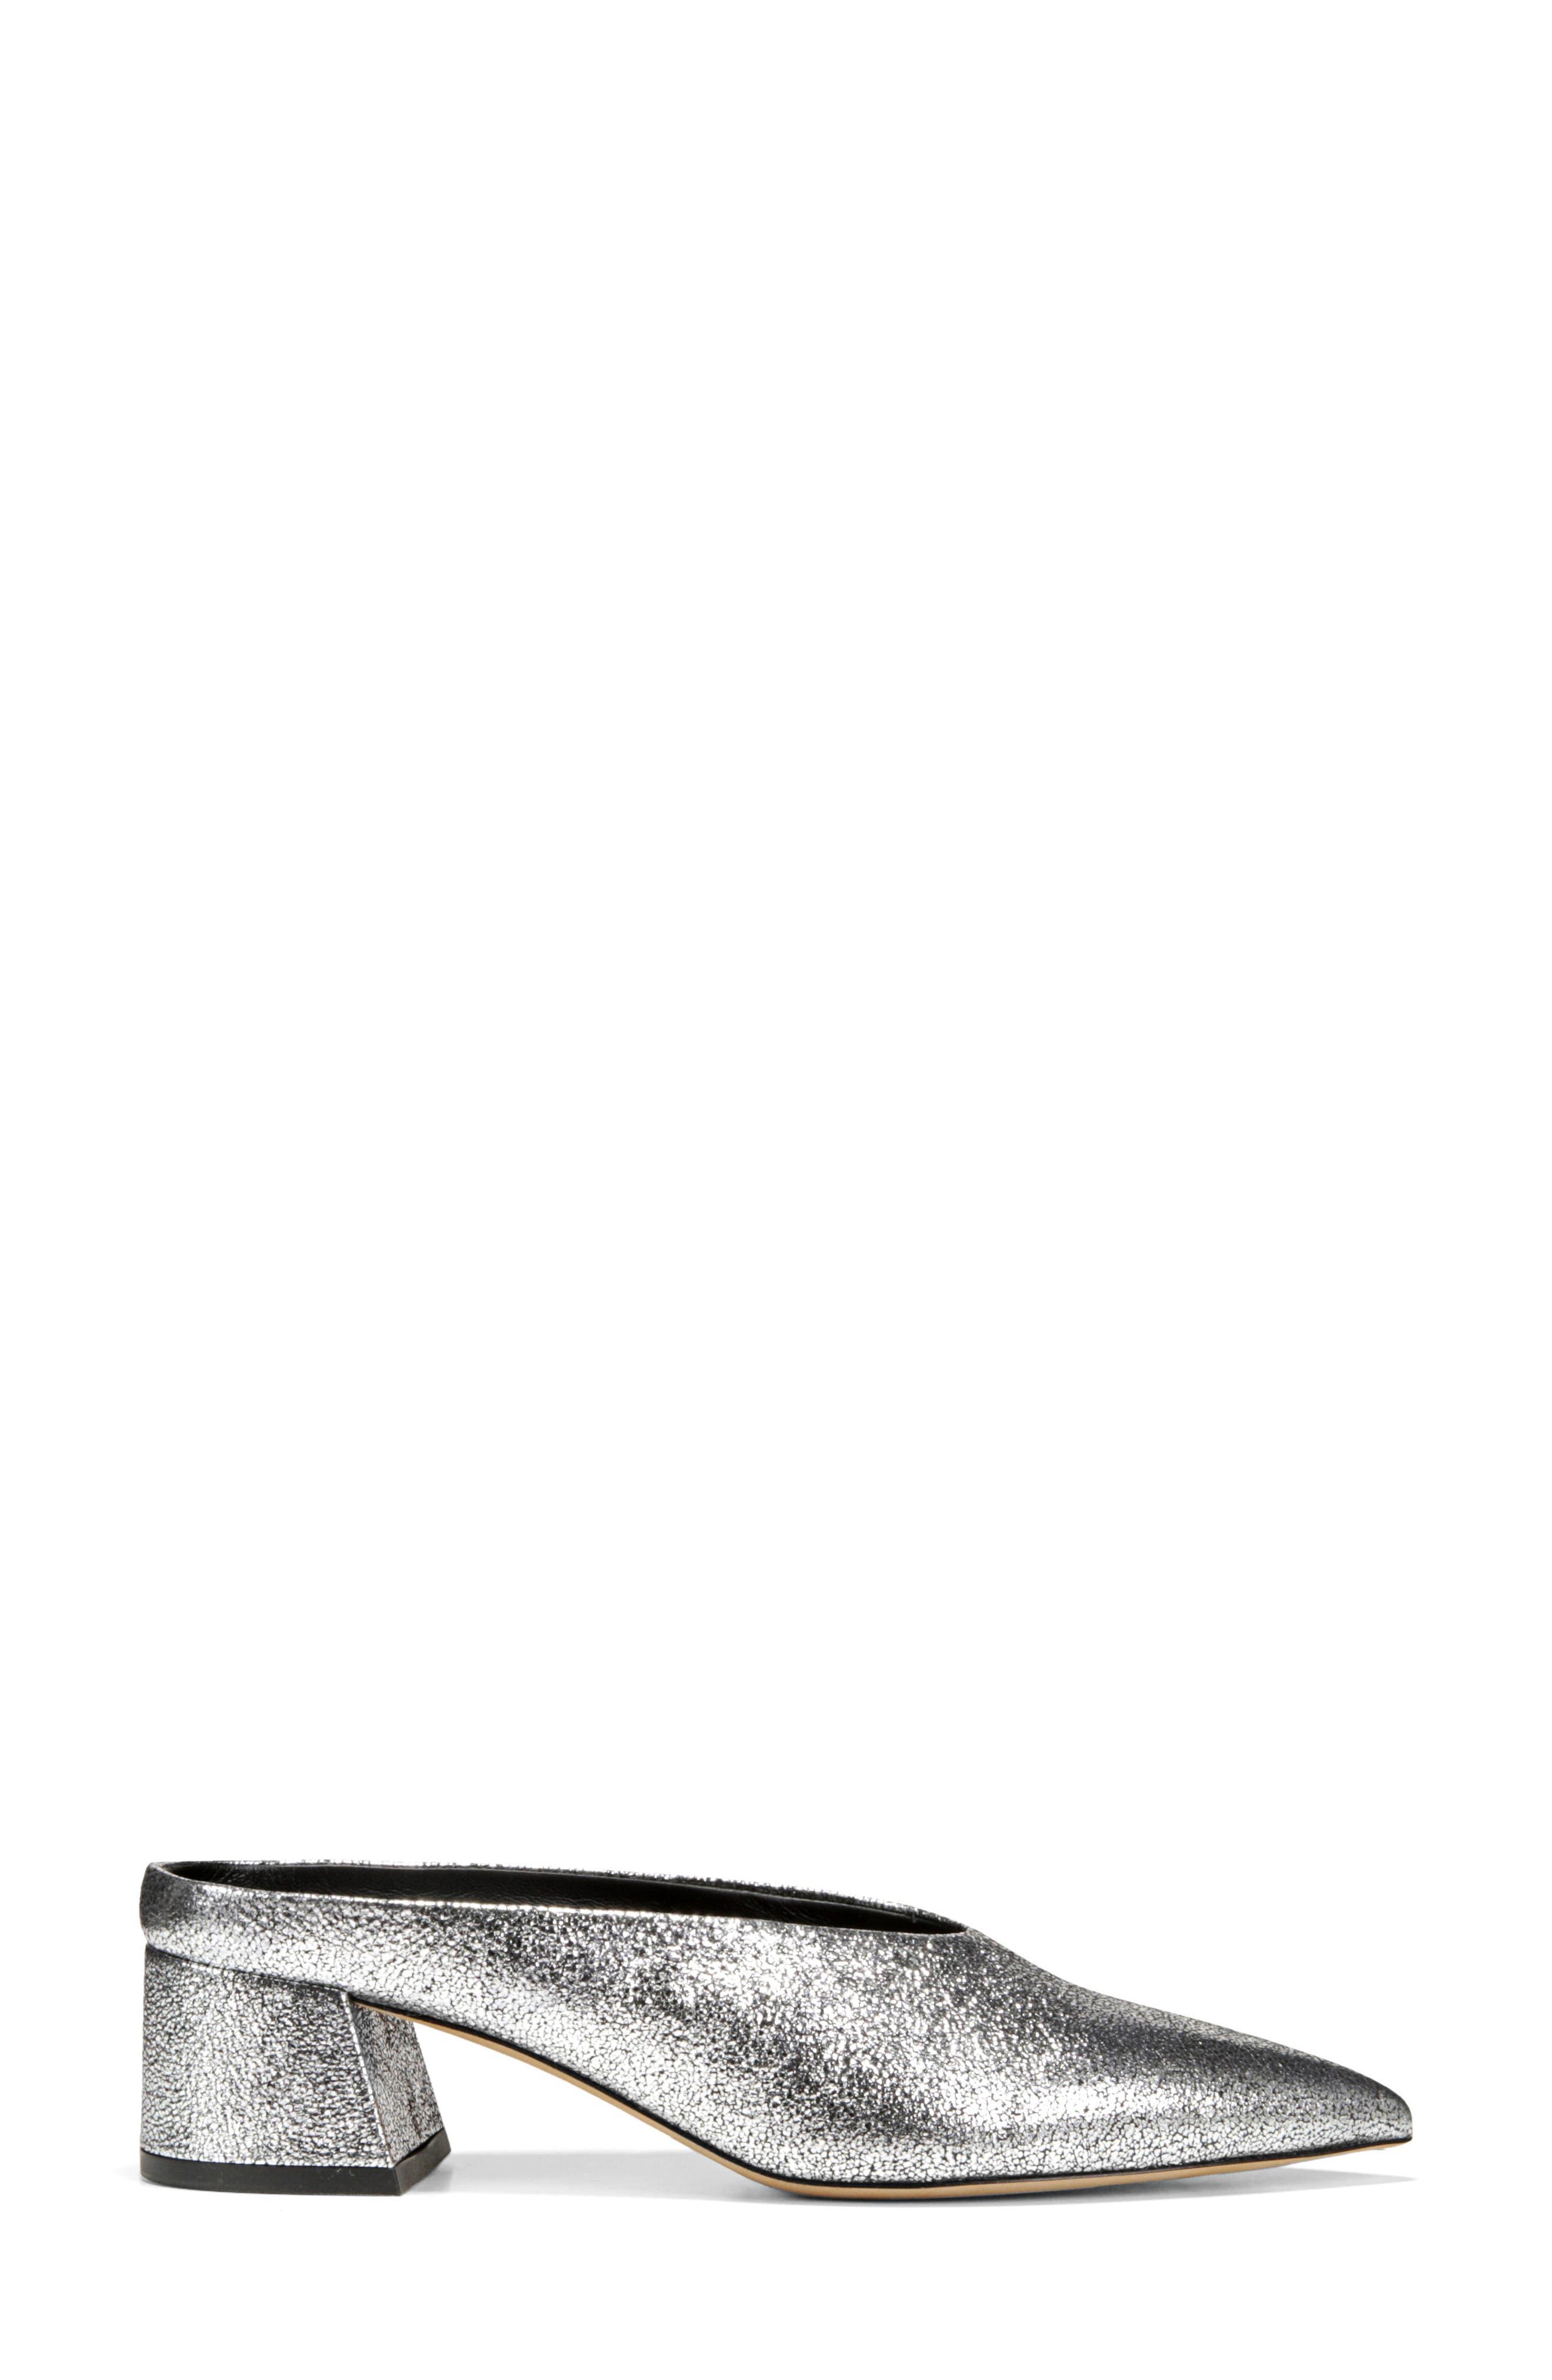 Ralston Pointy Toe Mule,                             Alternate thumbnail 3, color,                             SILVER METALLIC